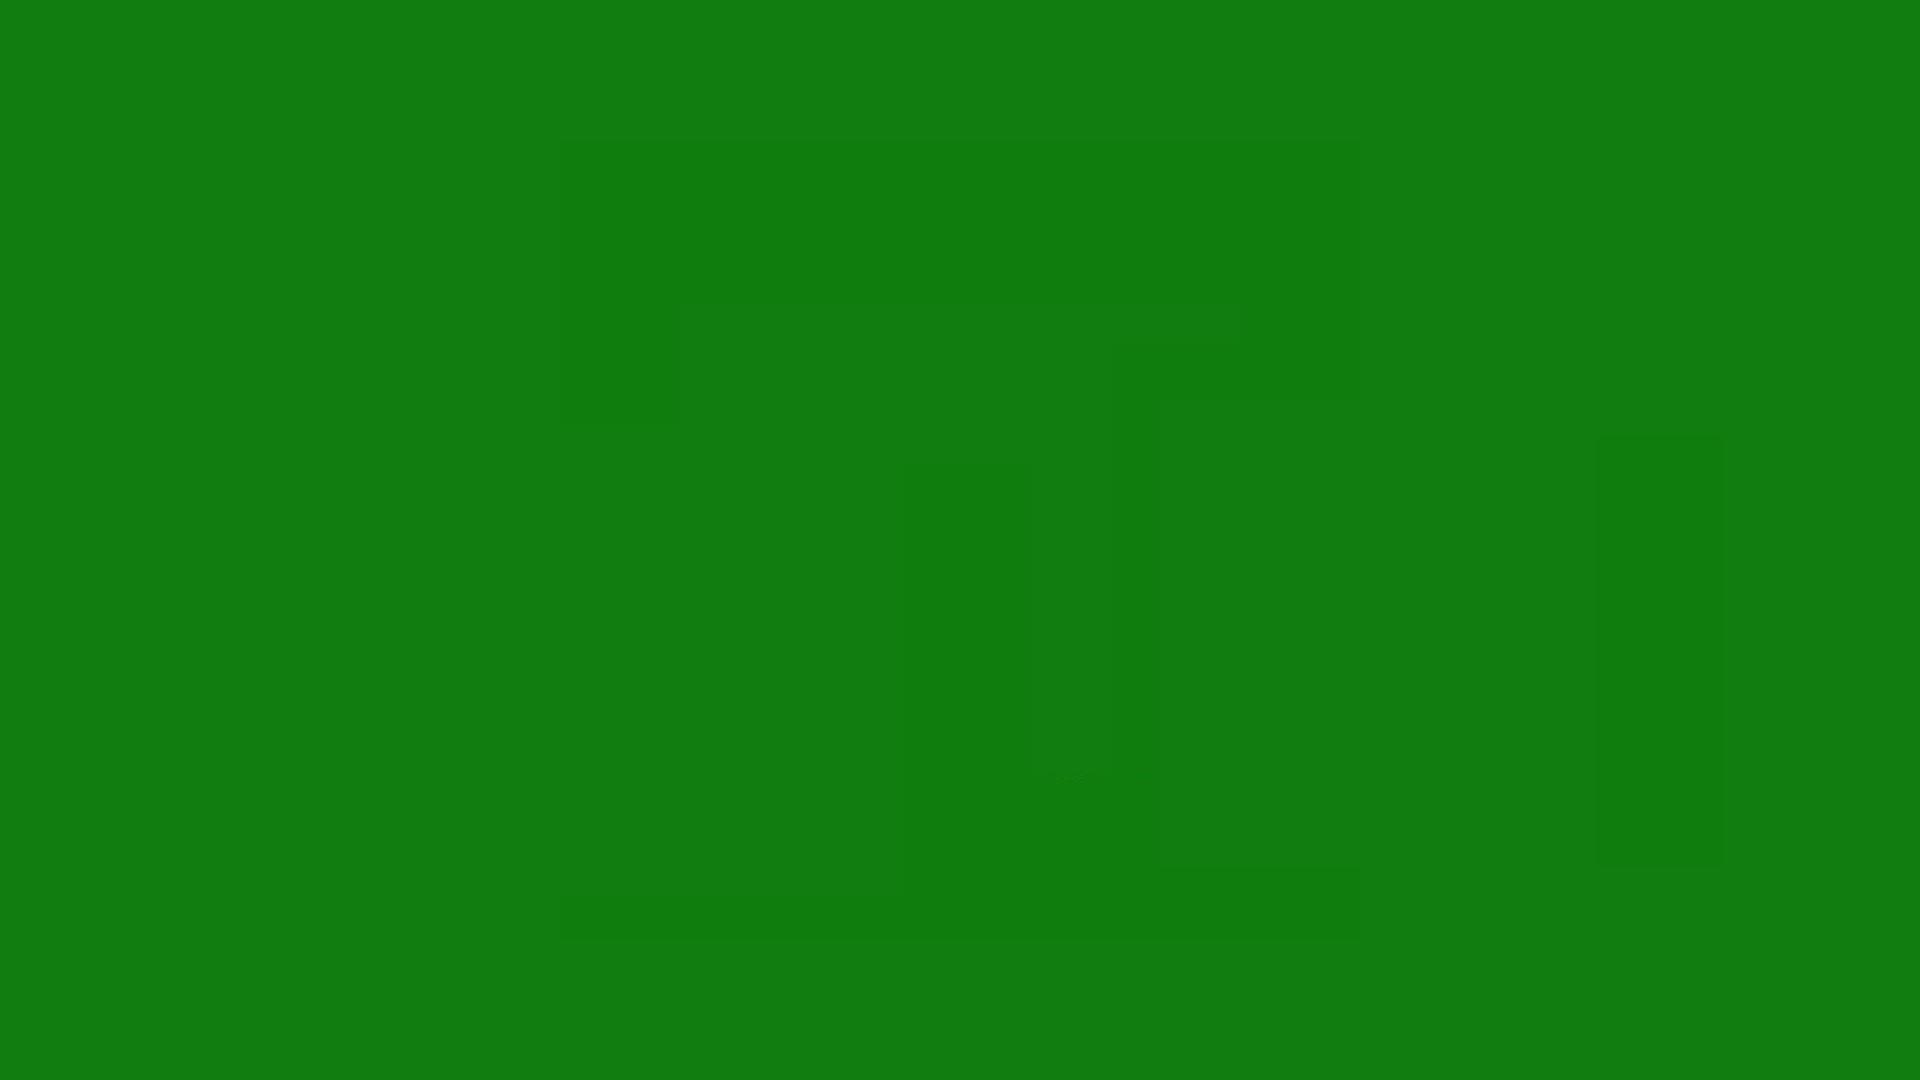 Xbox One Green Background   www.galleryhip.com – The .